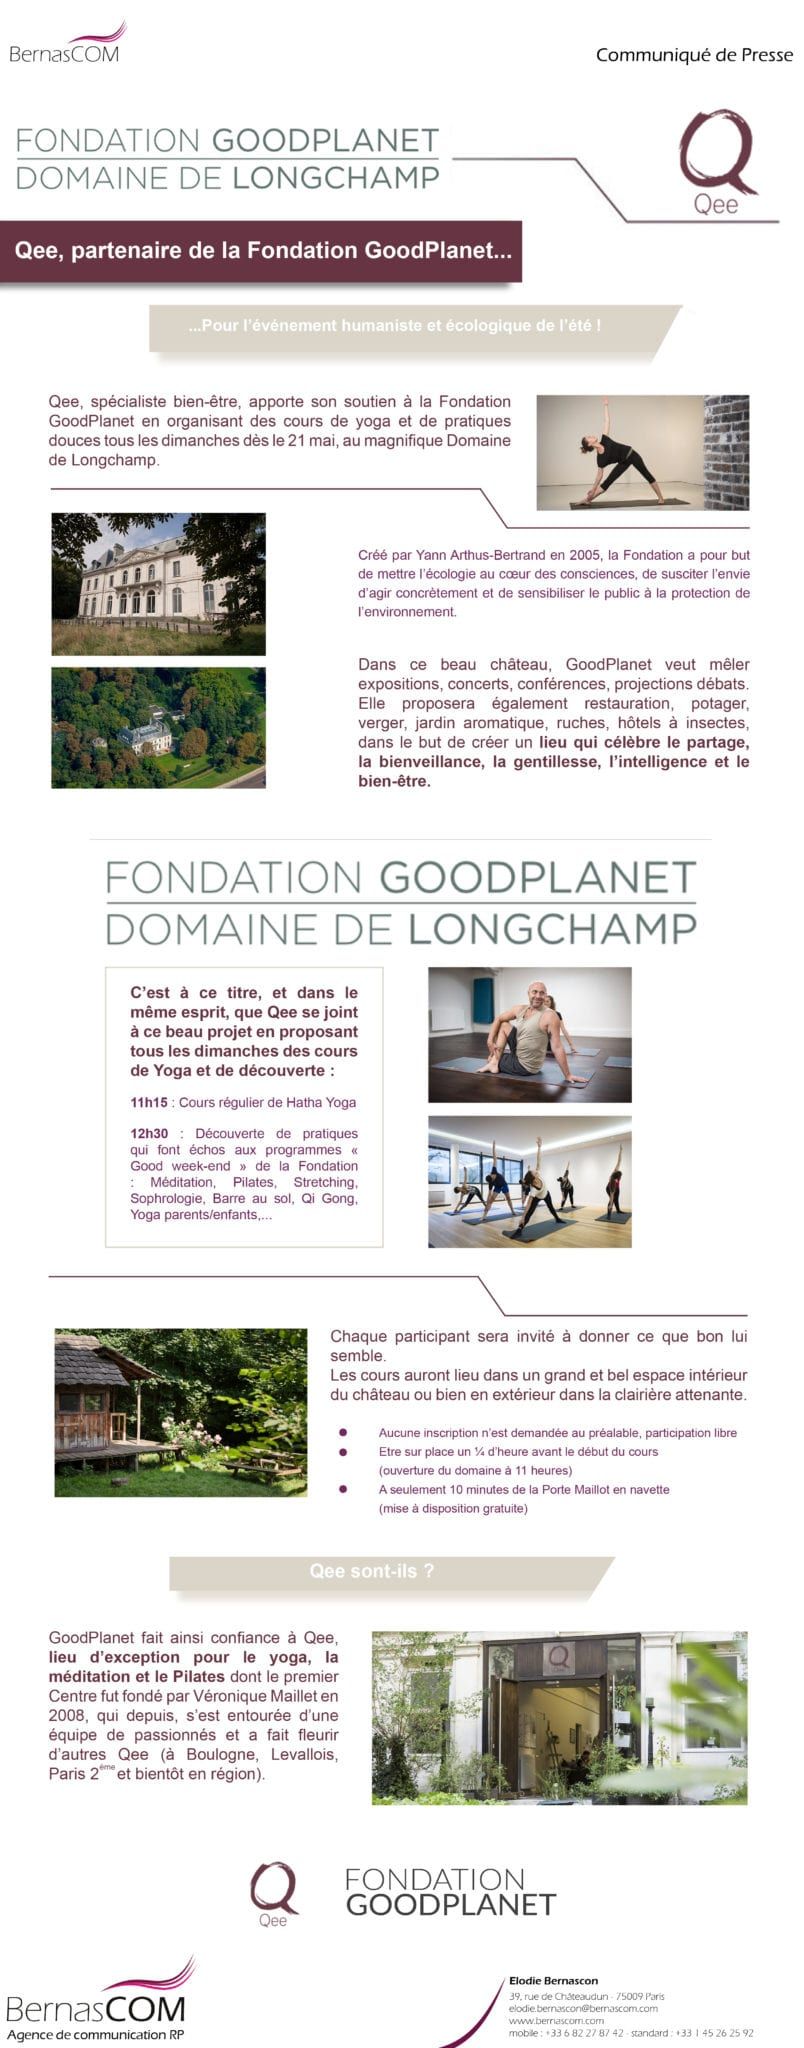 Communiqué de presse Qee GoodPlanet